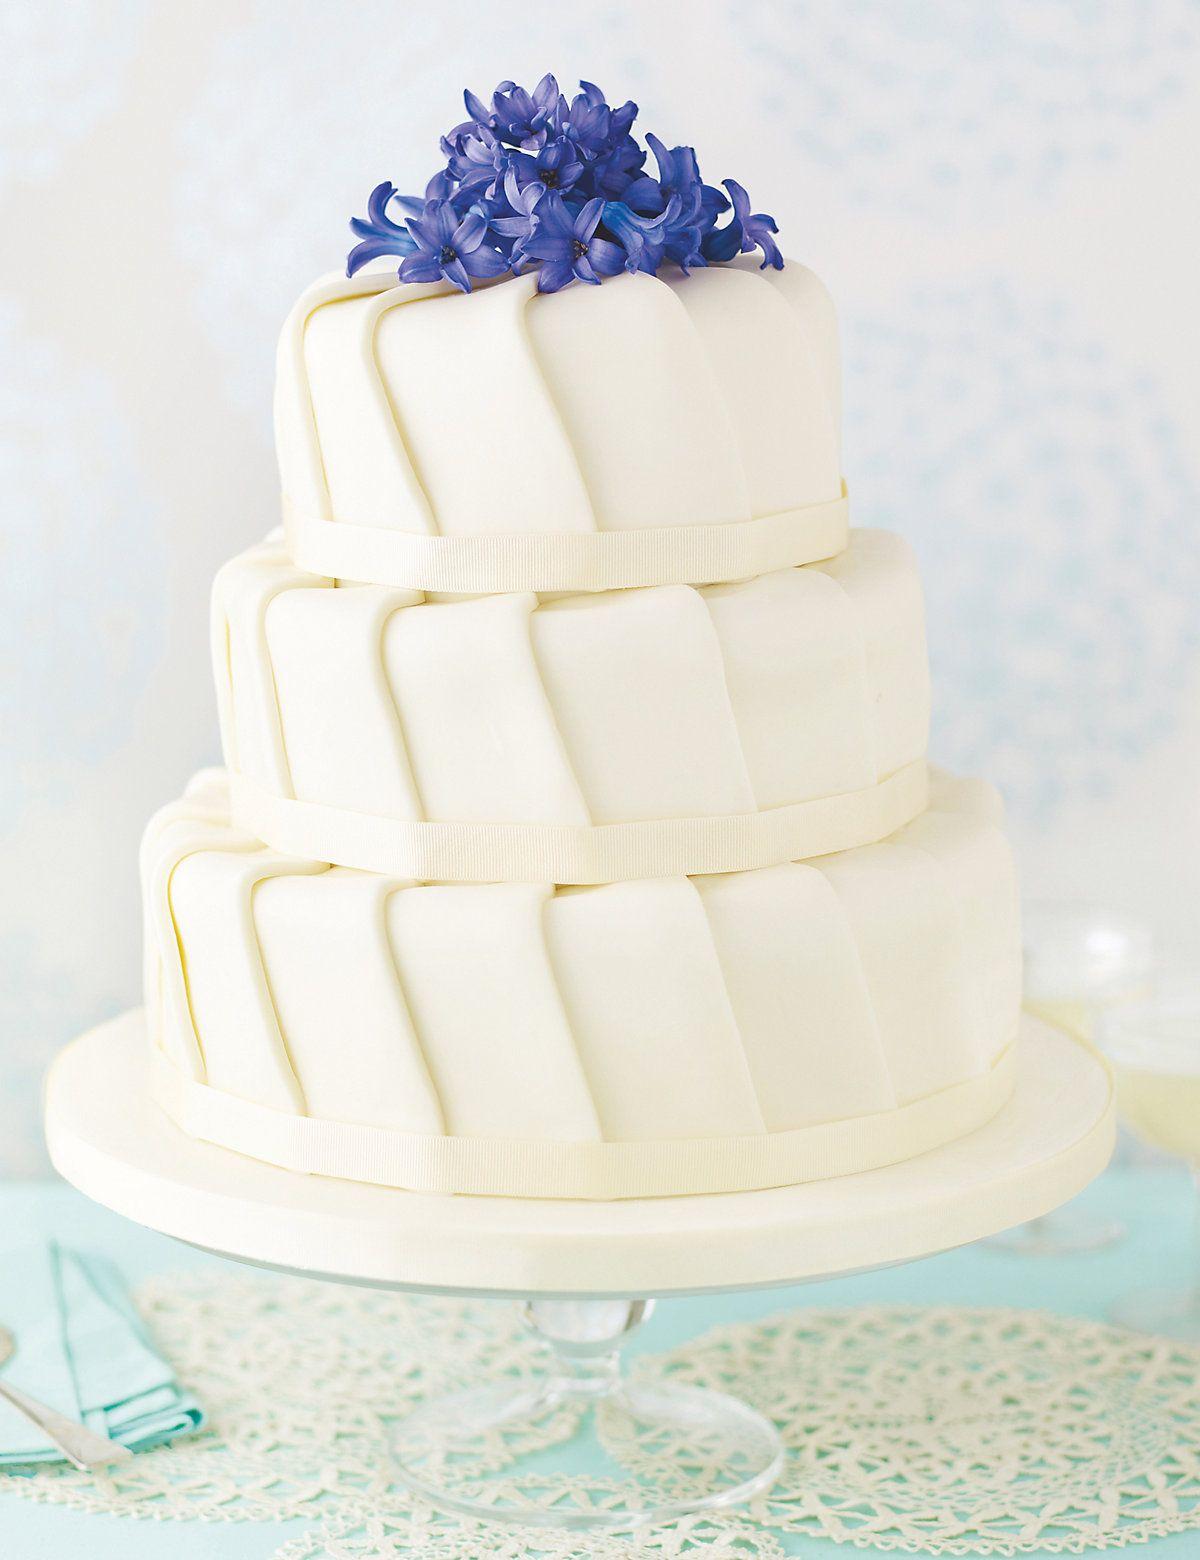 Ruffle Fruit Wedding Cake | Yum yum!!! | Pinterest | Fruit wedding ...